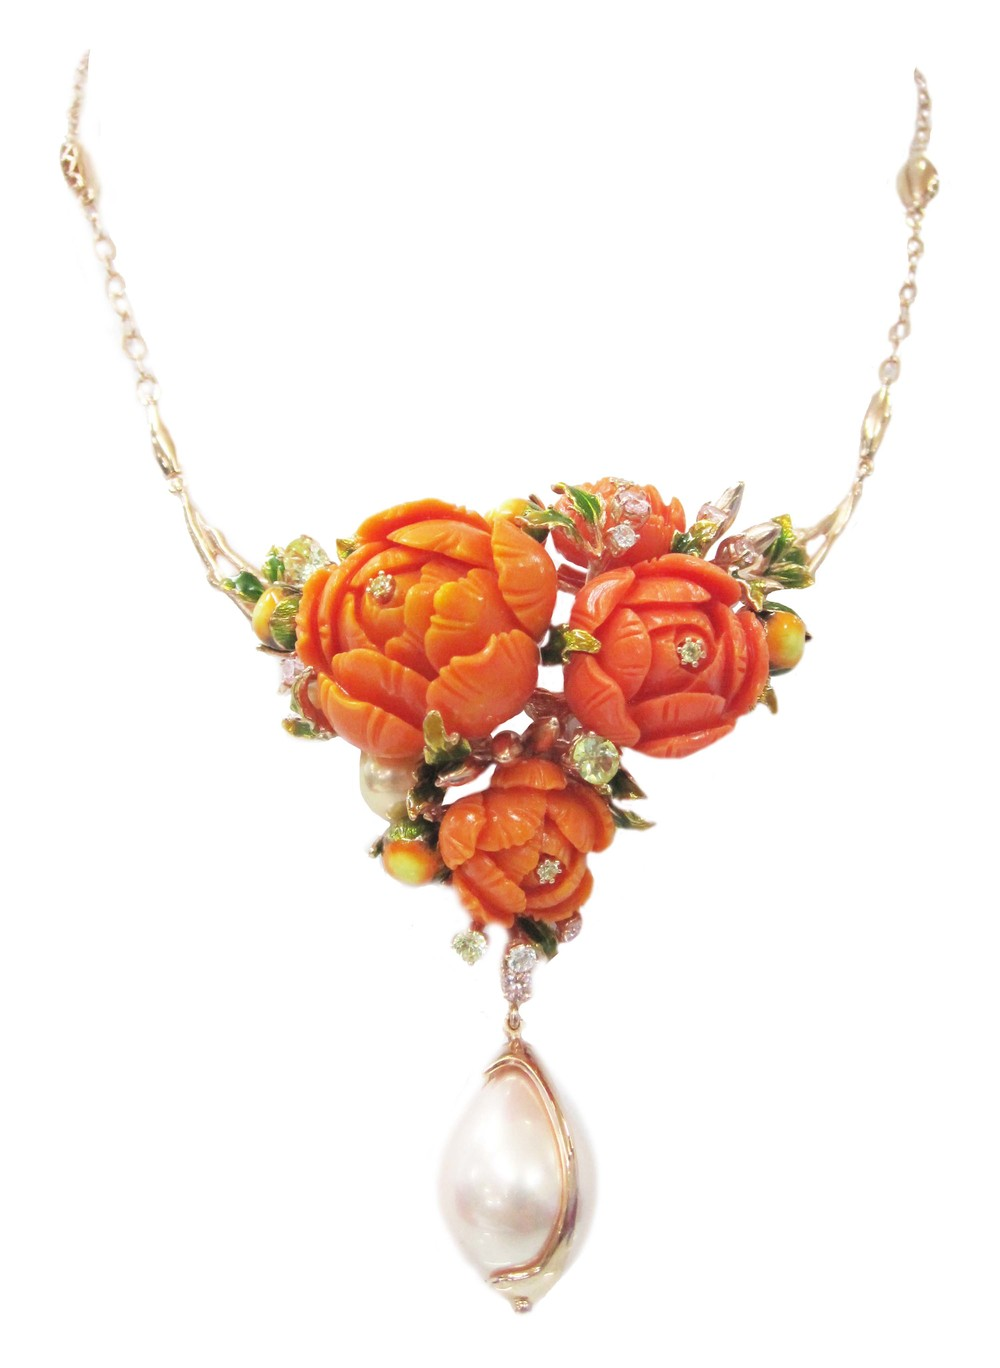 Style Avenue | Van Gundys Jewelers | Camarillo CA